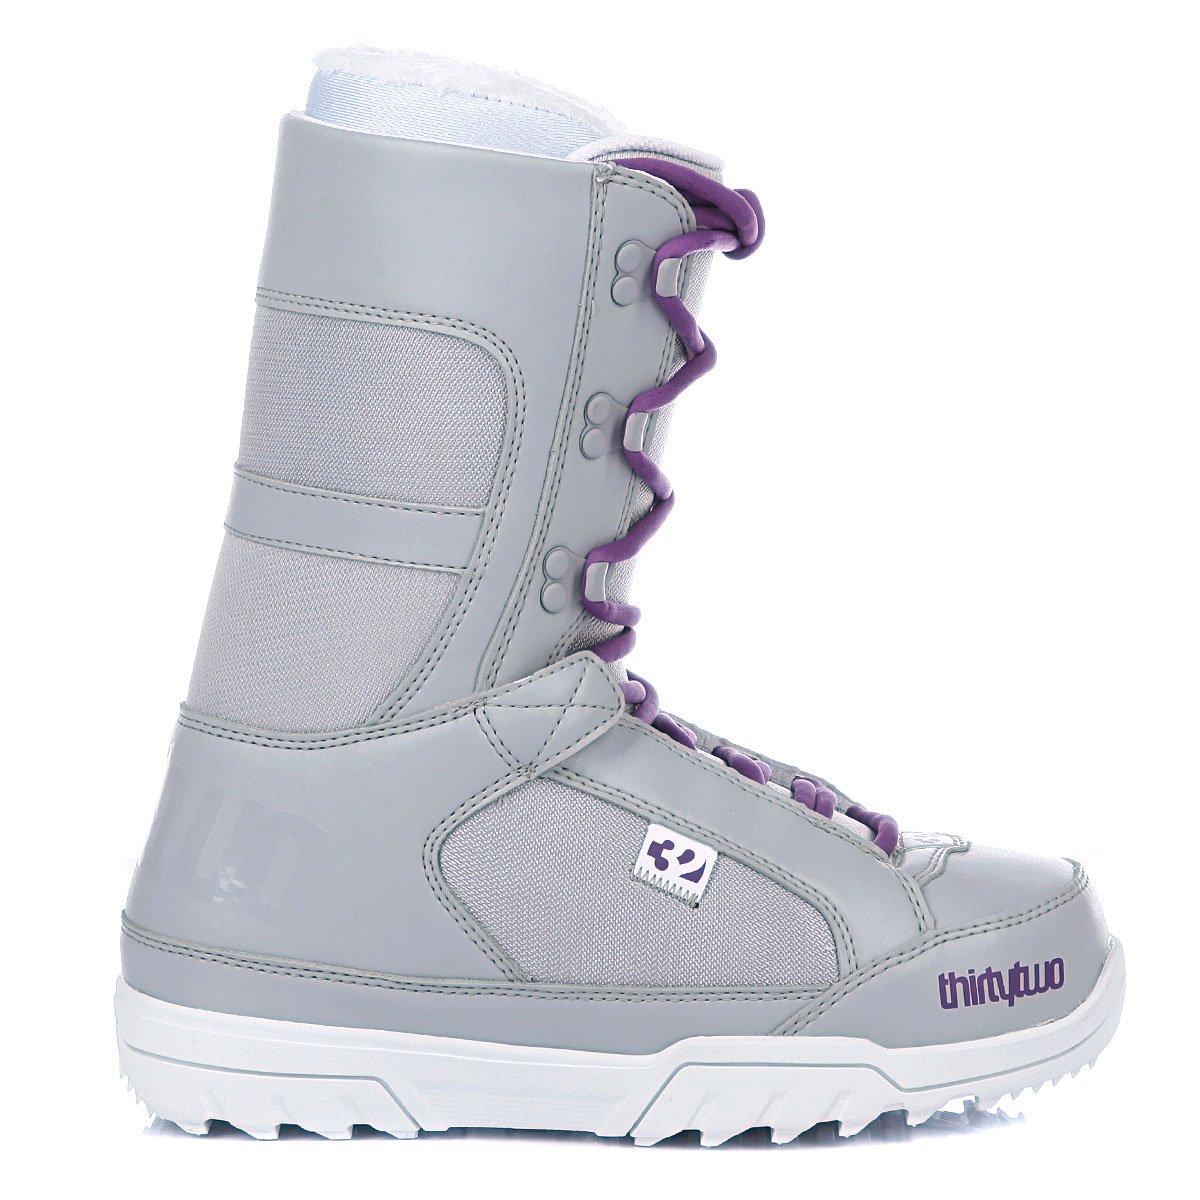 b47c02eff09a Купить ботинки для сноуборда женские Thirty Two Prion Ft WS 12 Black ...